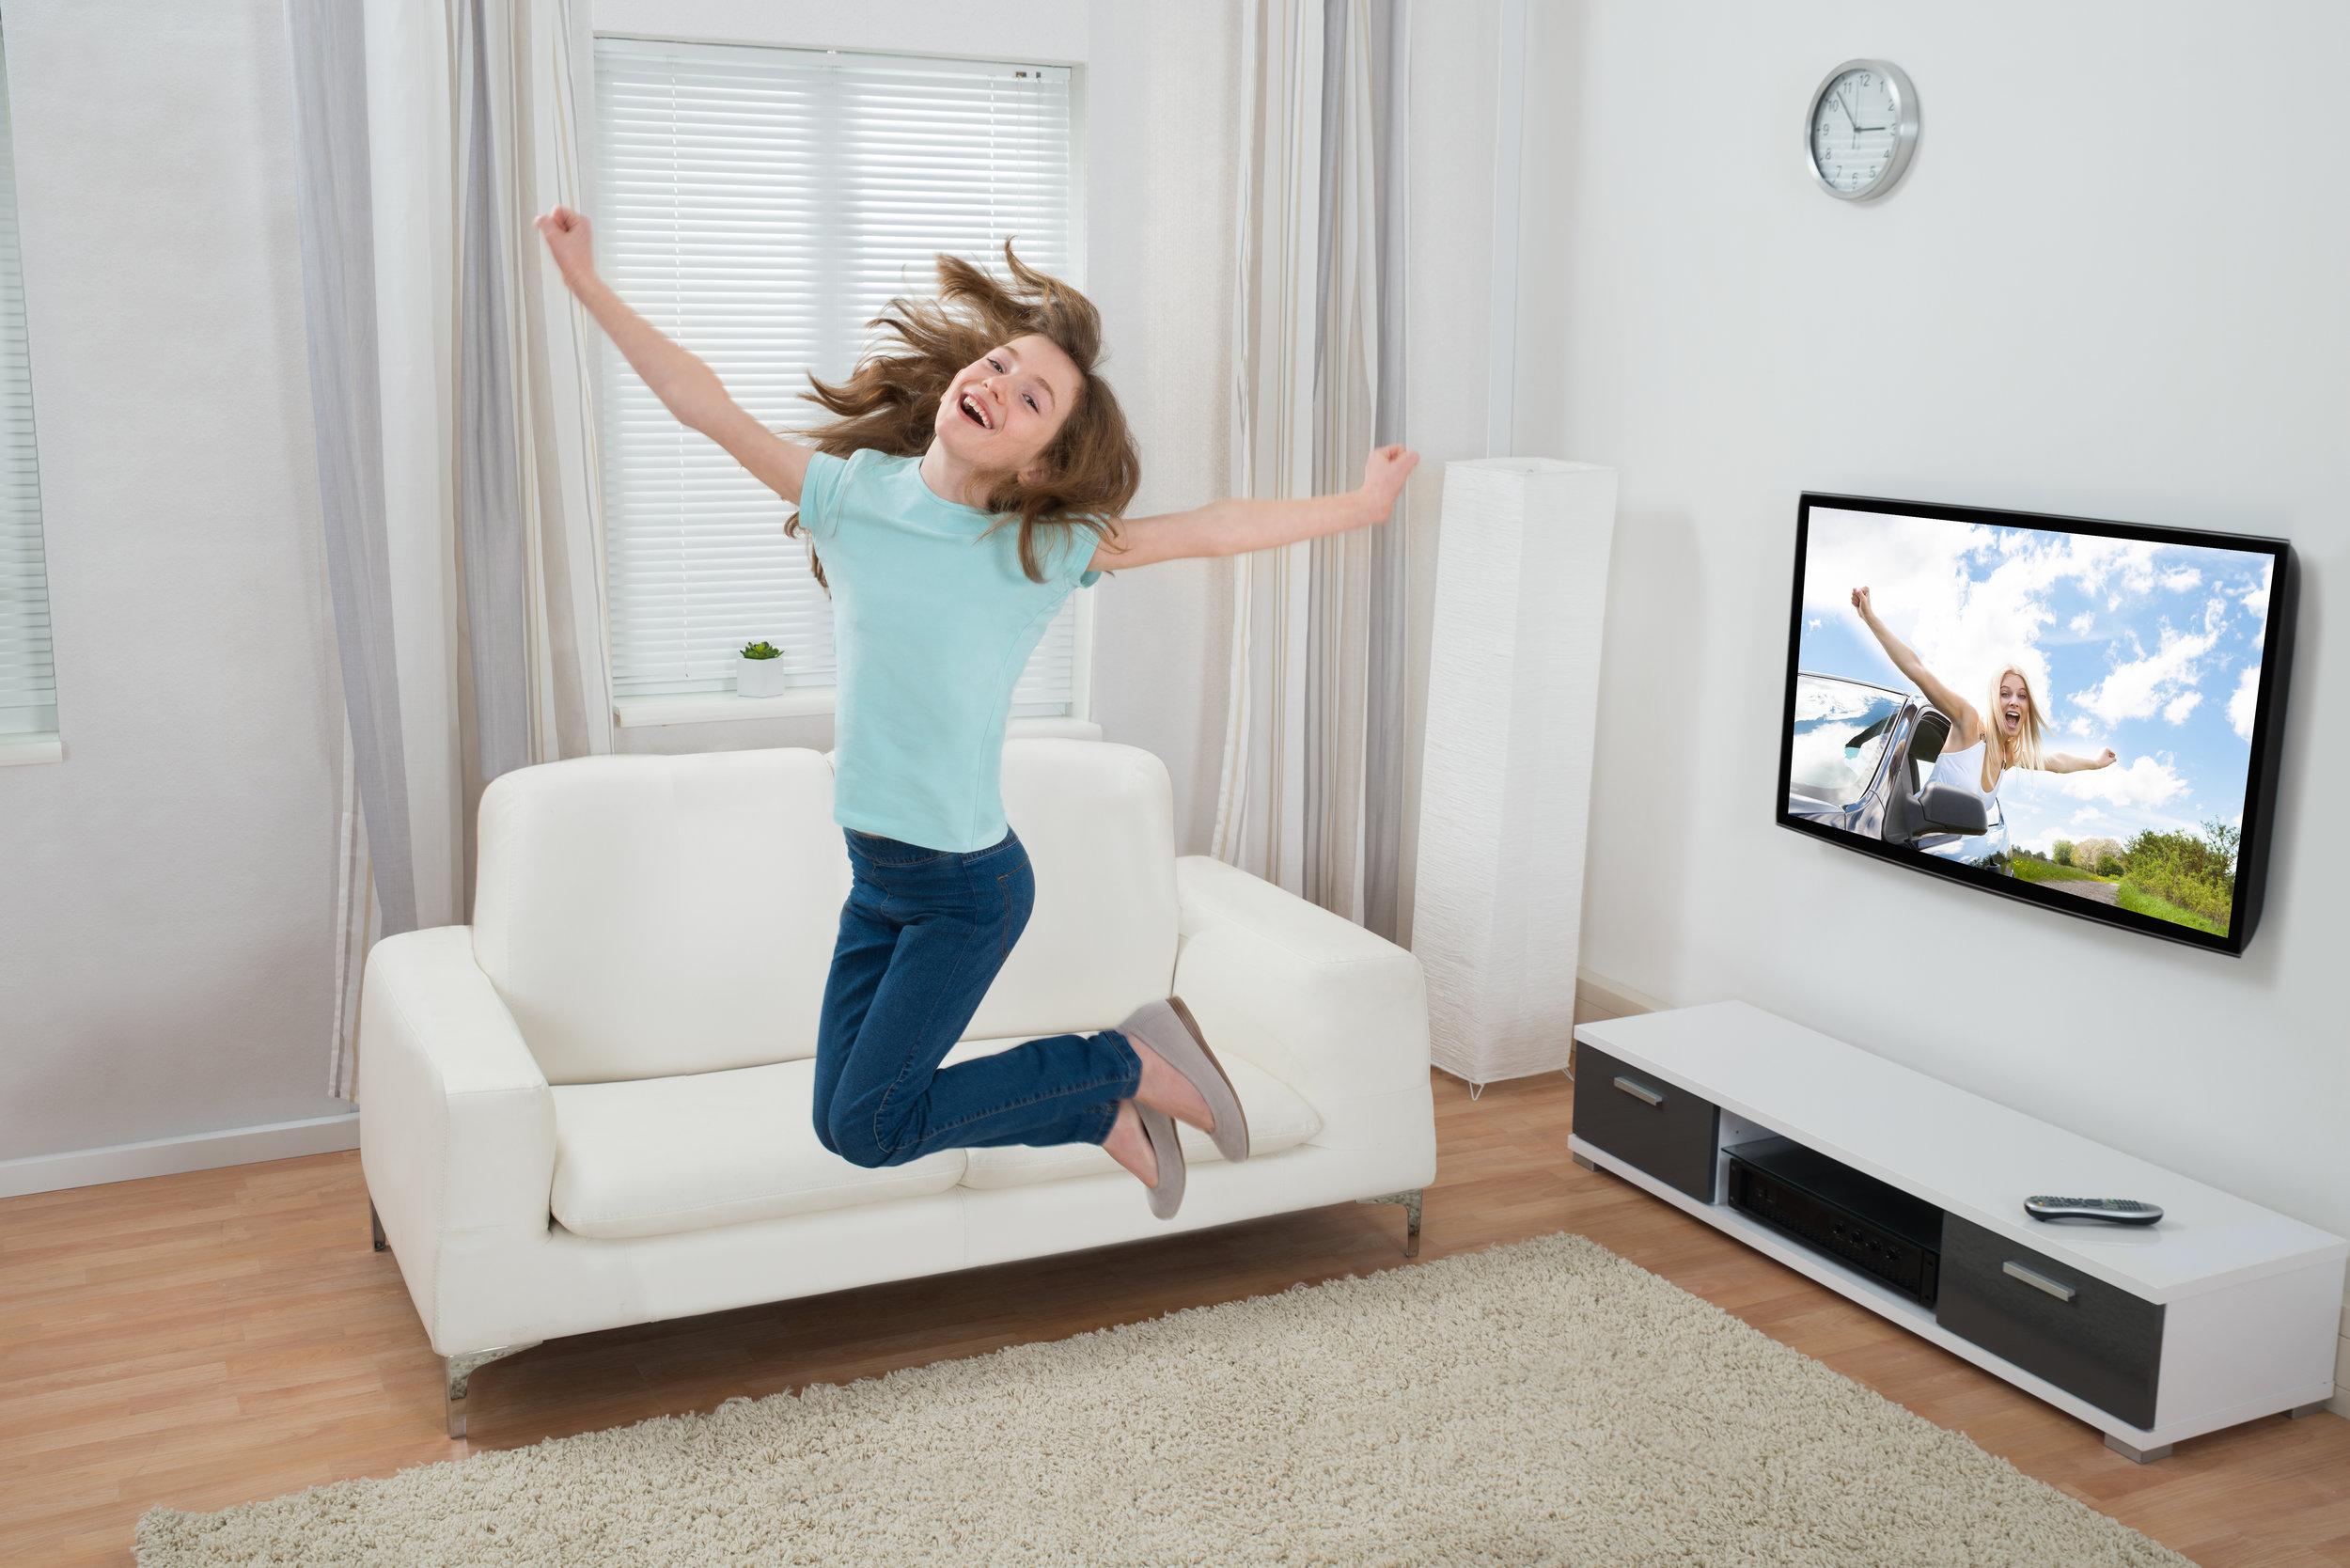 Girl Jumping In Living Room